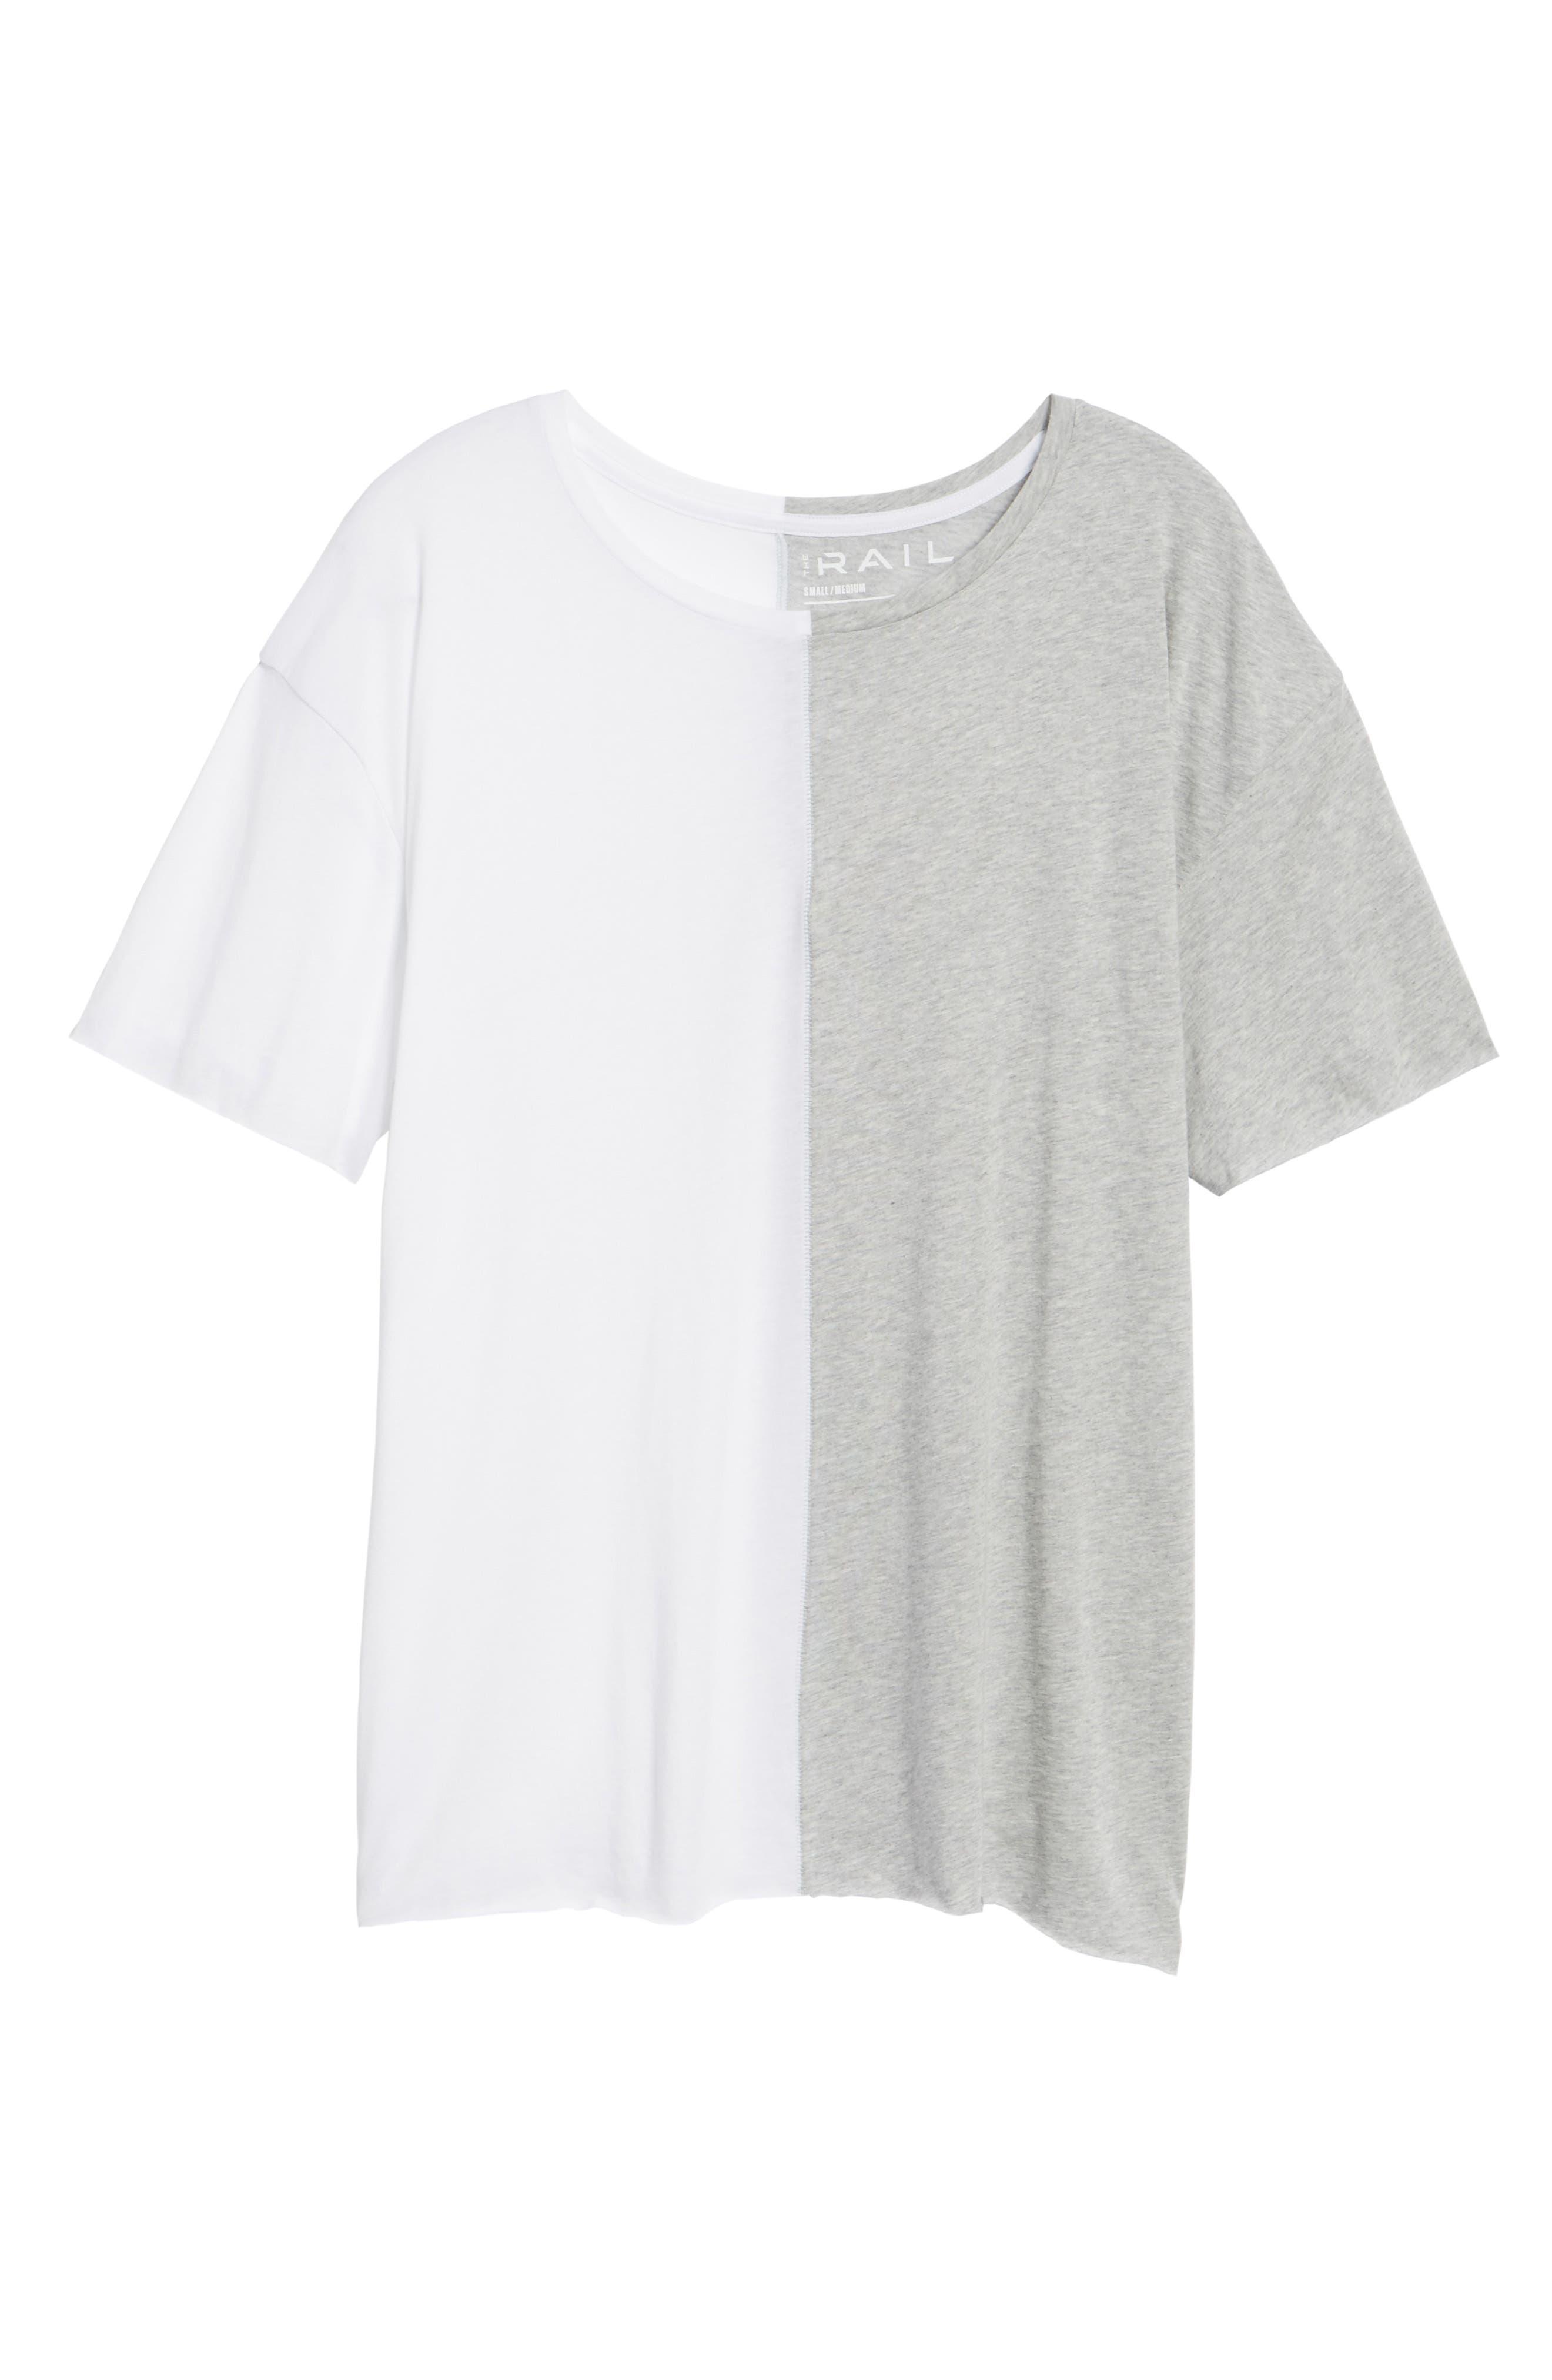 Boxy Splice T-Shirt,                             Alternate thumbnail 6, color,                             White/ Grey Heather